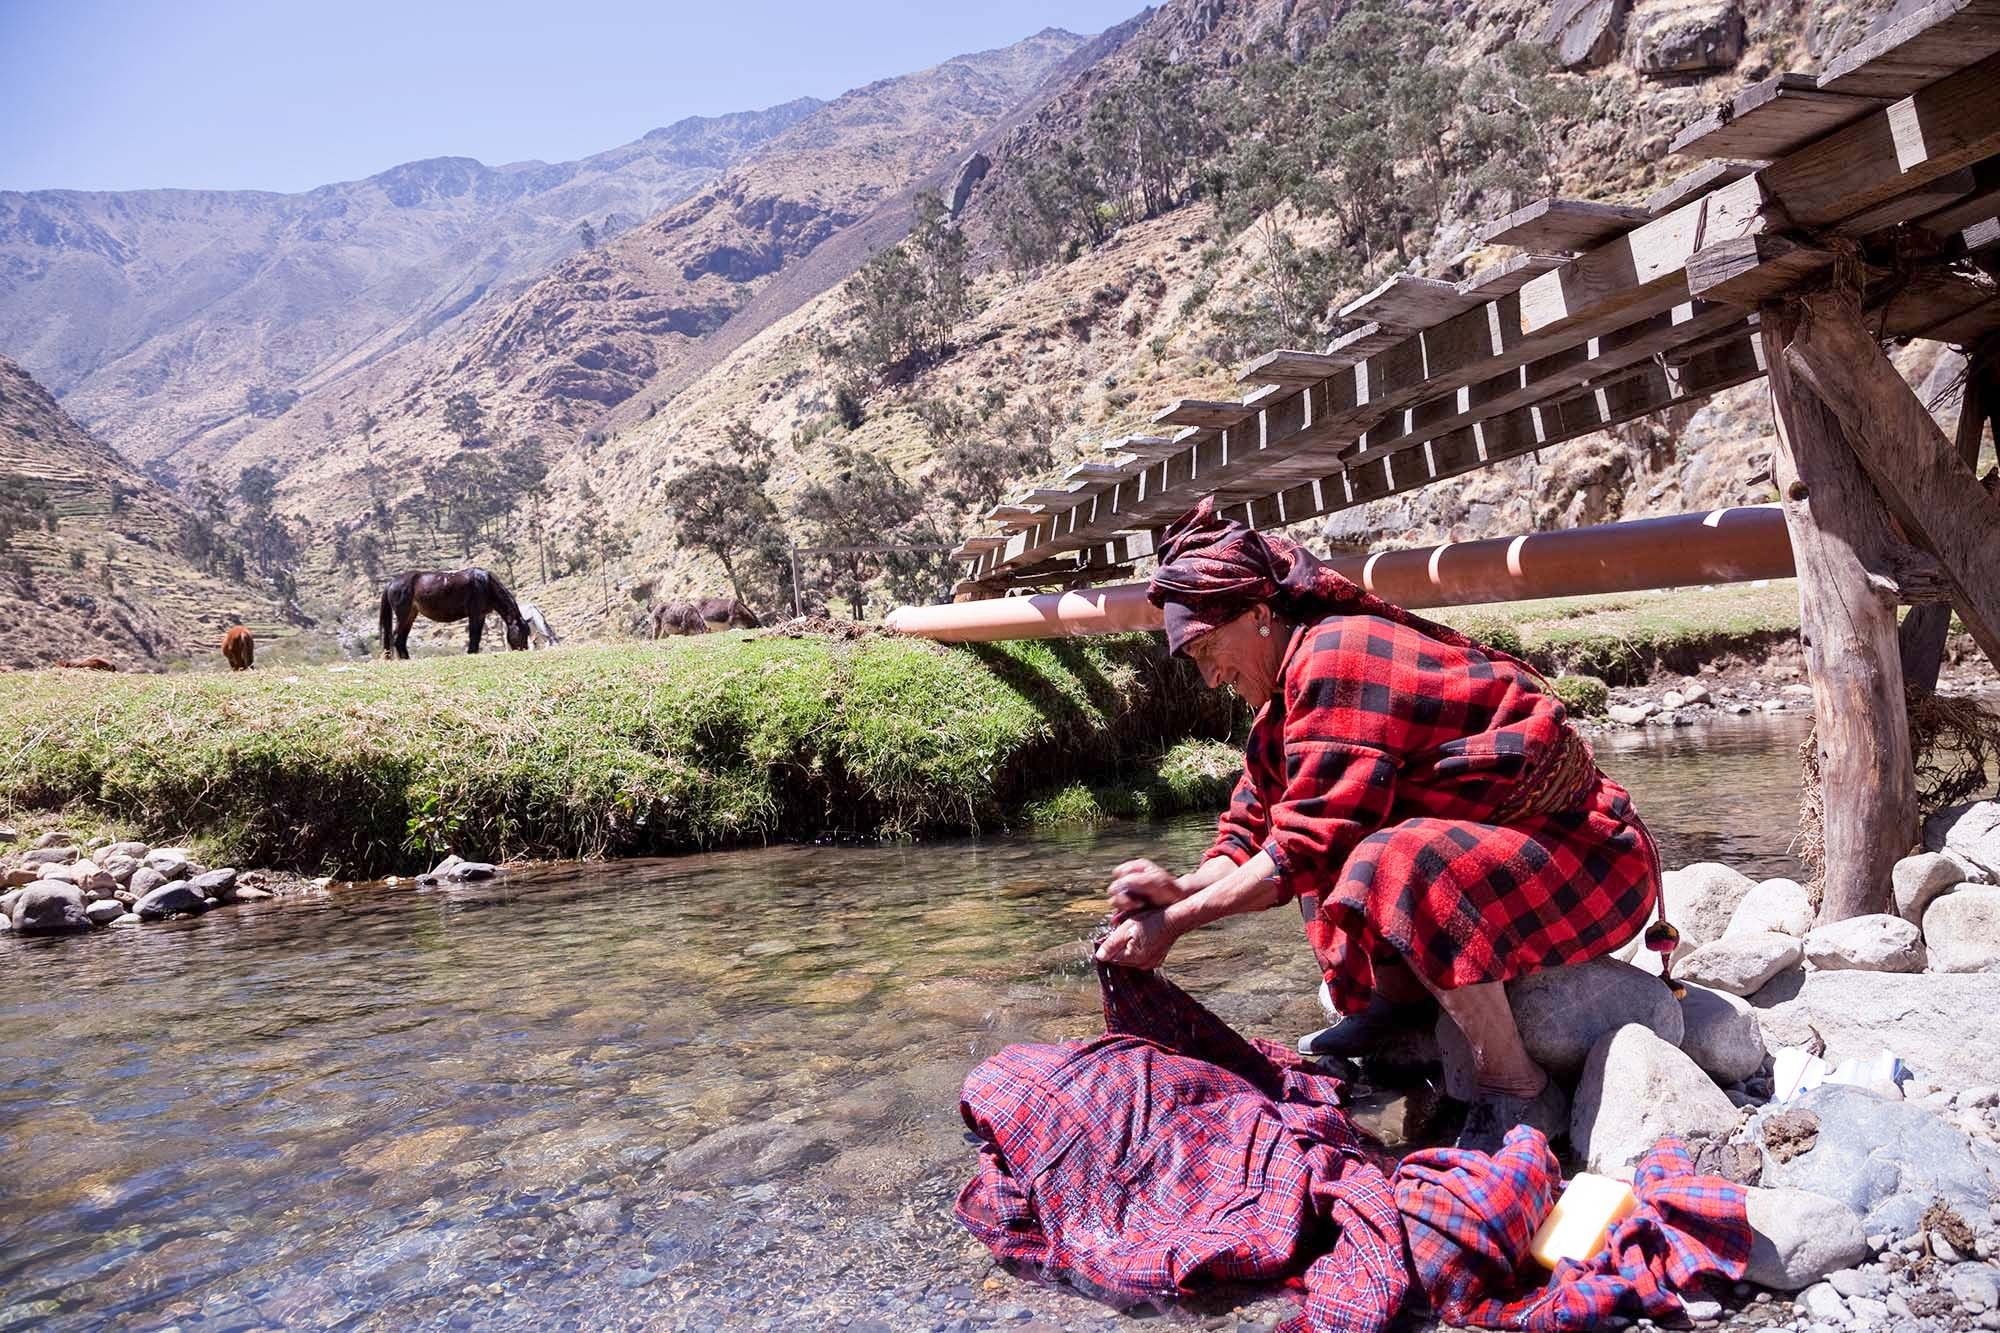 Washing clothes in Cuchapaya.